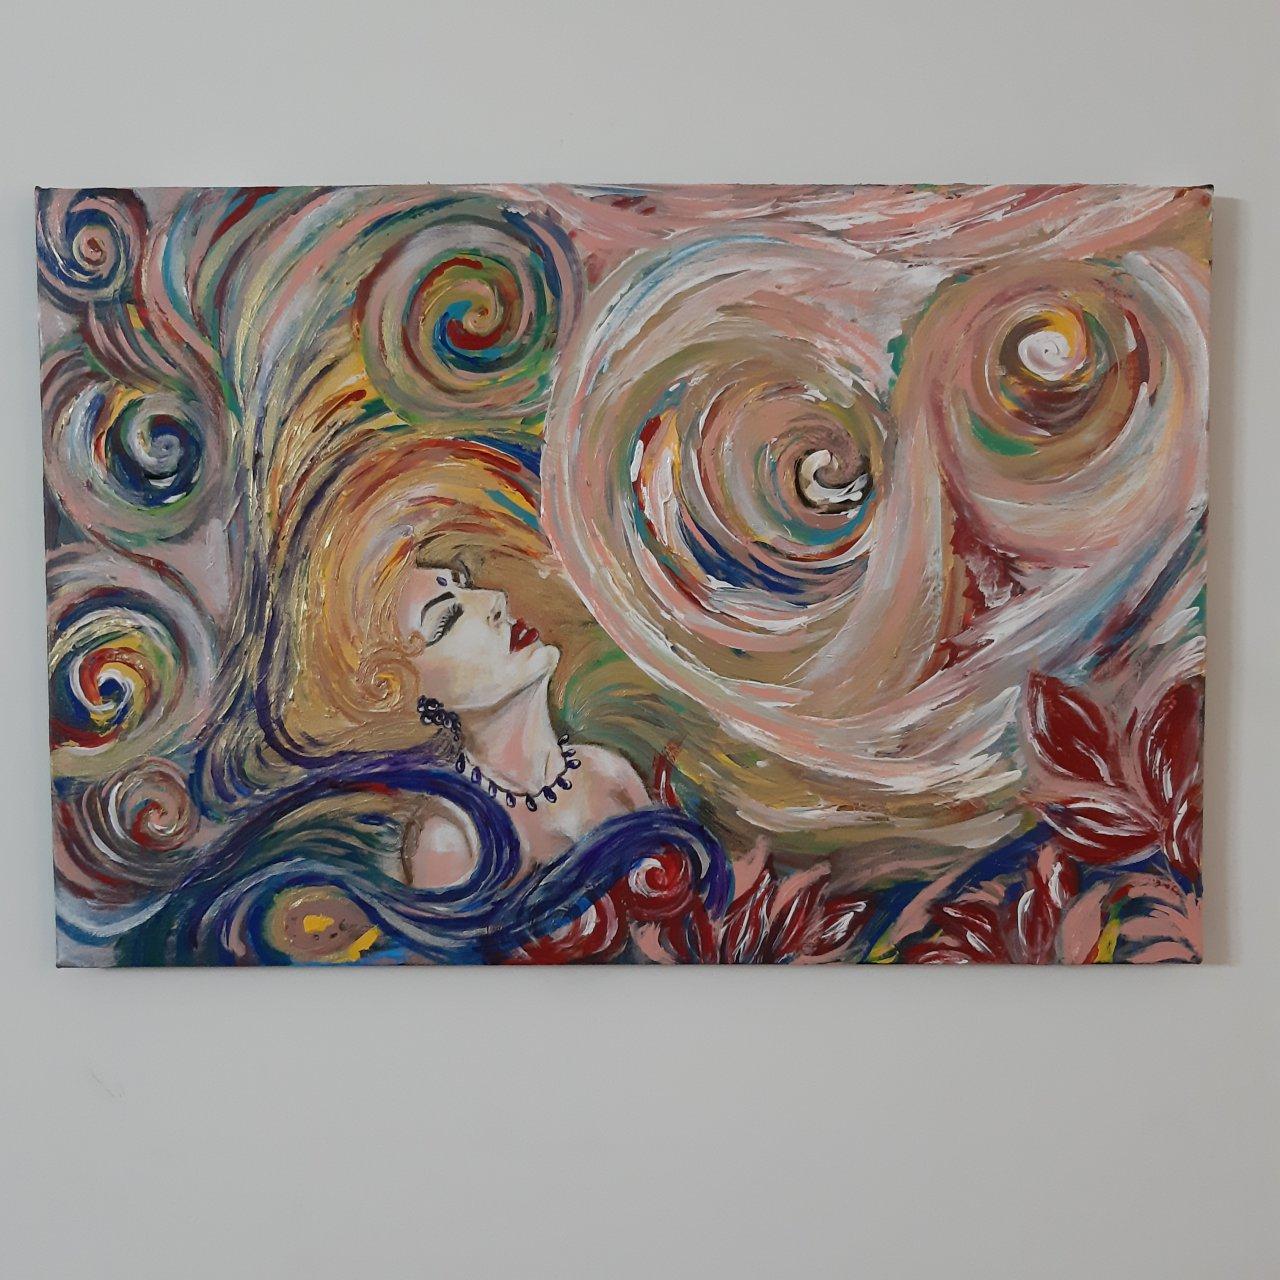 تابلو نقاشی طرح الهه ی رنگها